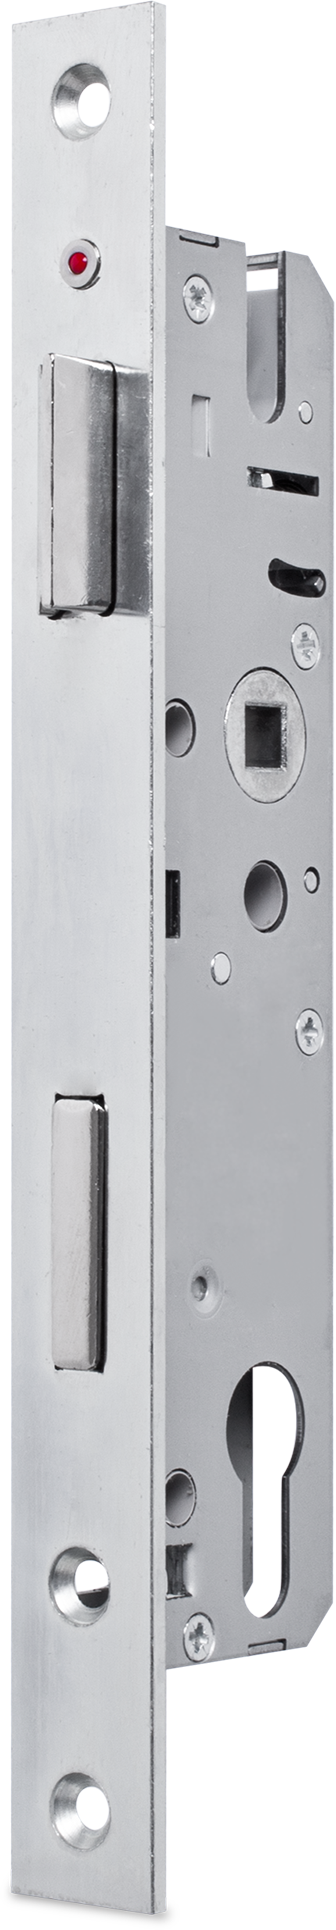 Einsteckschloss mit Wechsel, Dornmaß 30 mm, Entfernung 92 mm, Vierkantnuss 8 mm, Falle und Riegel bündig, Riegel mit Stahlstift, DIN rechts / links verwendbar